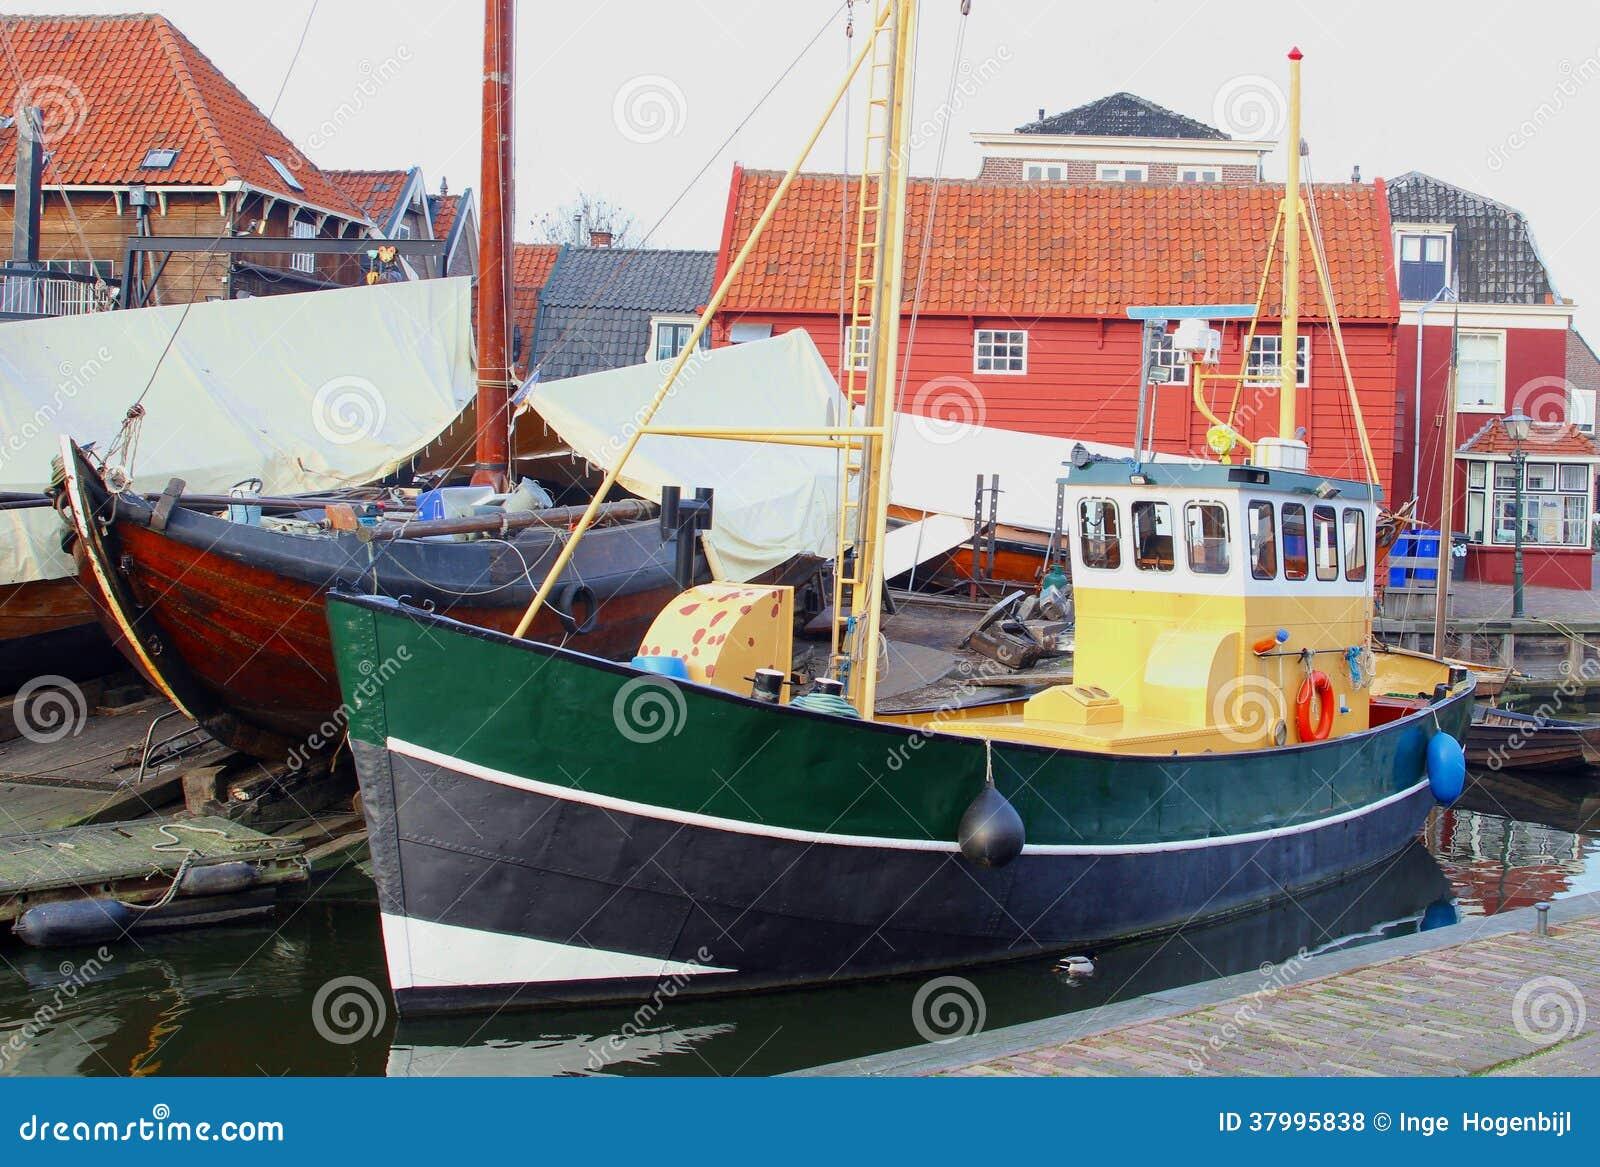 Fishing vessels in the harbor of fishing village Bunschoten Spakenburg ...